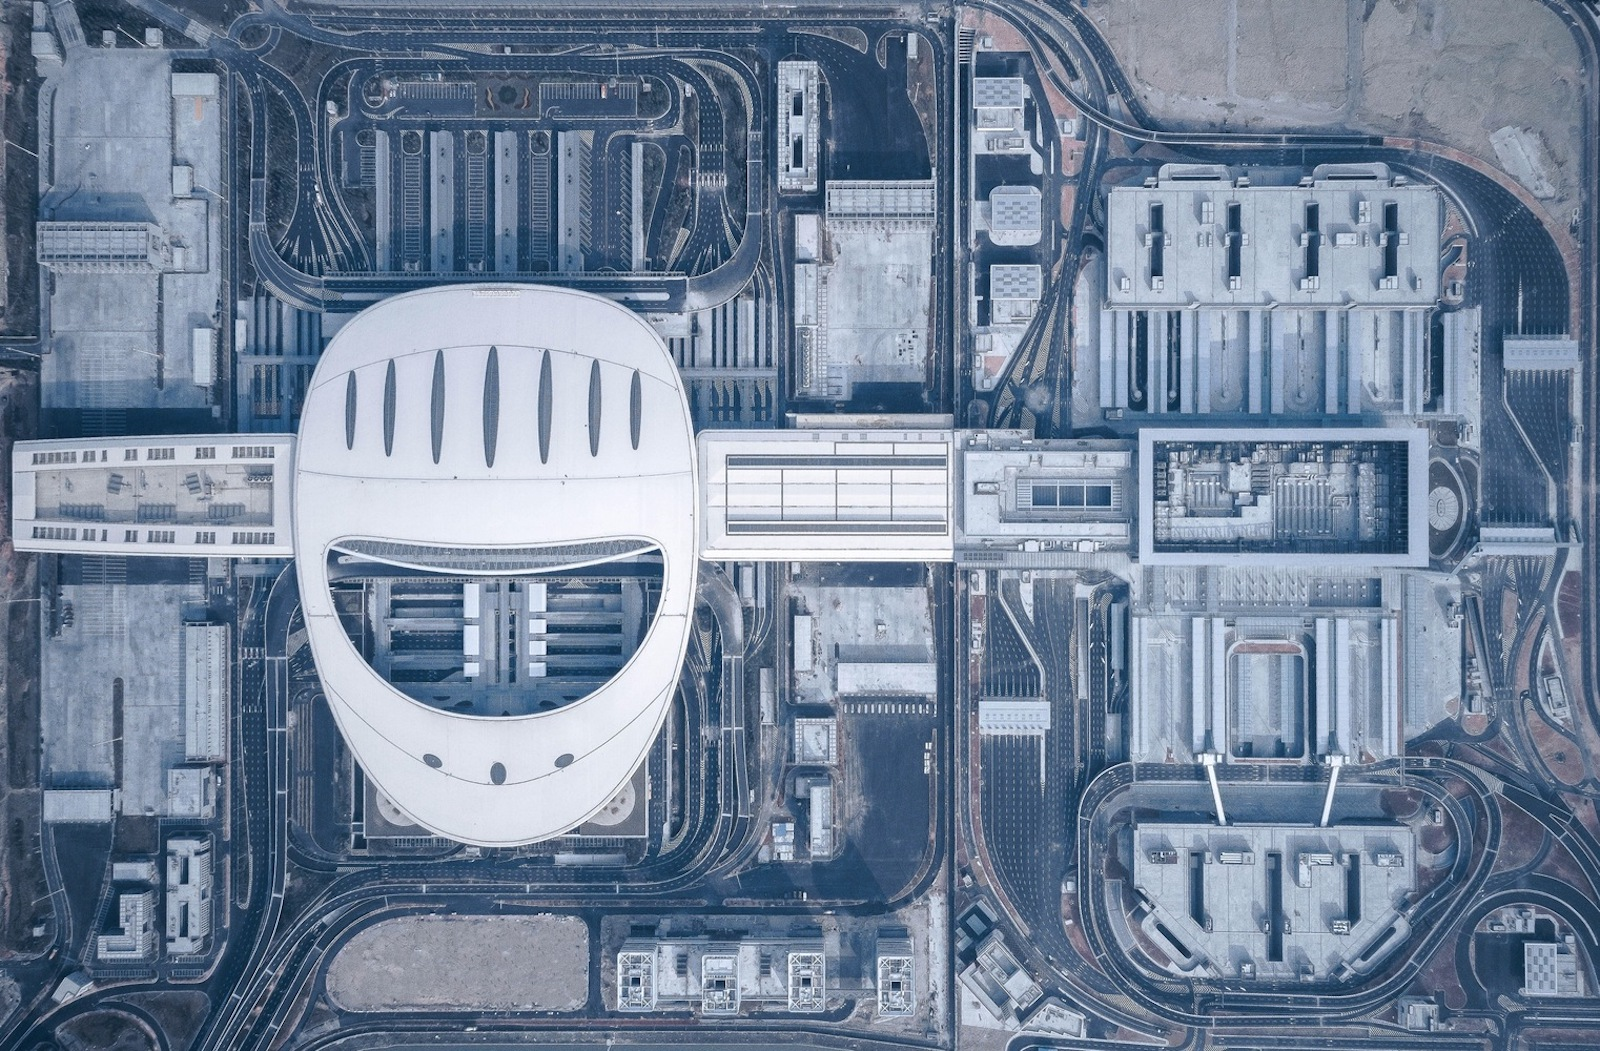 Transportation architecture: Aerial view of Hong Kong-Zhuhai_Macao Bridge by ECADI